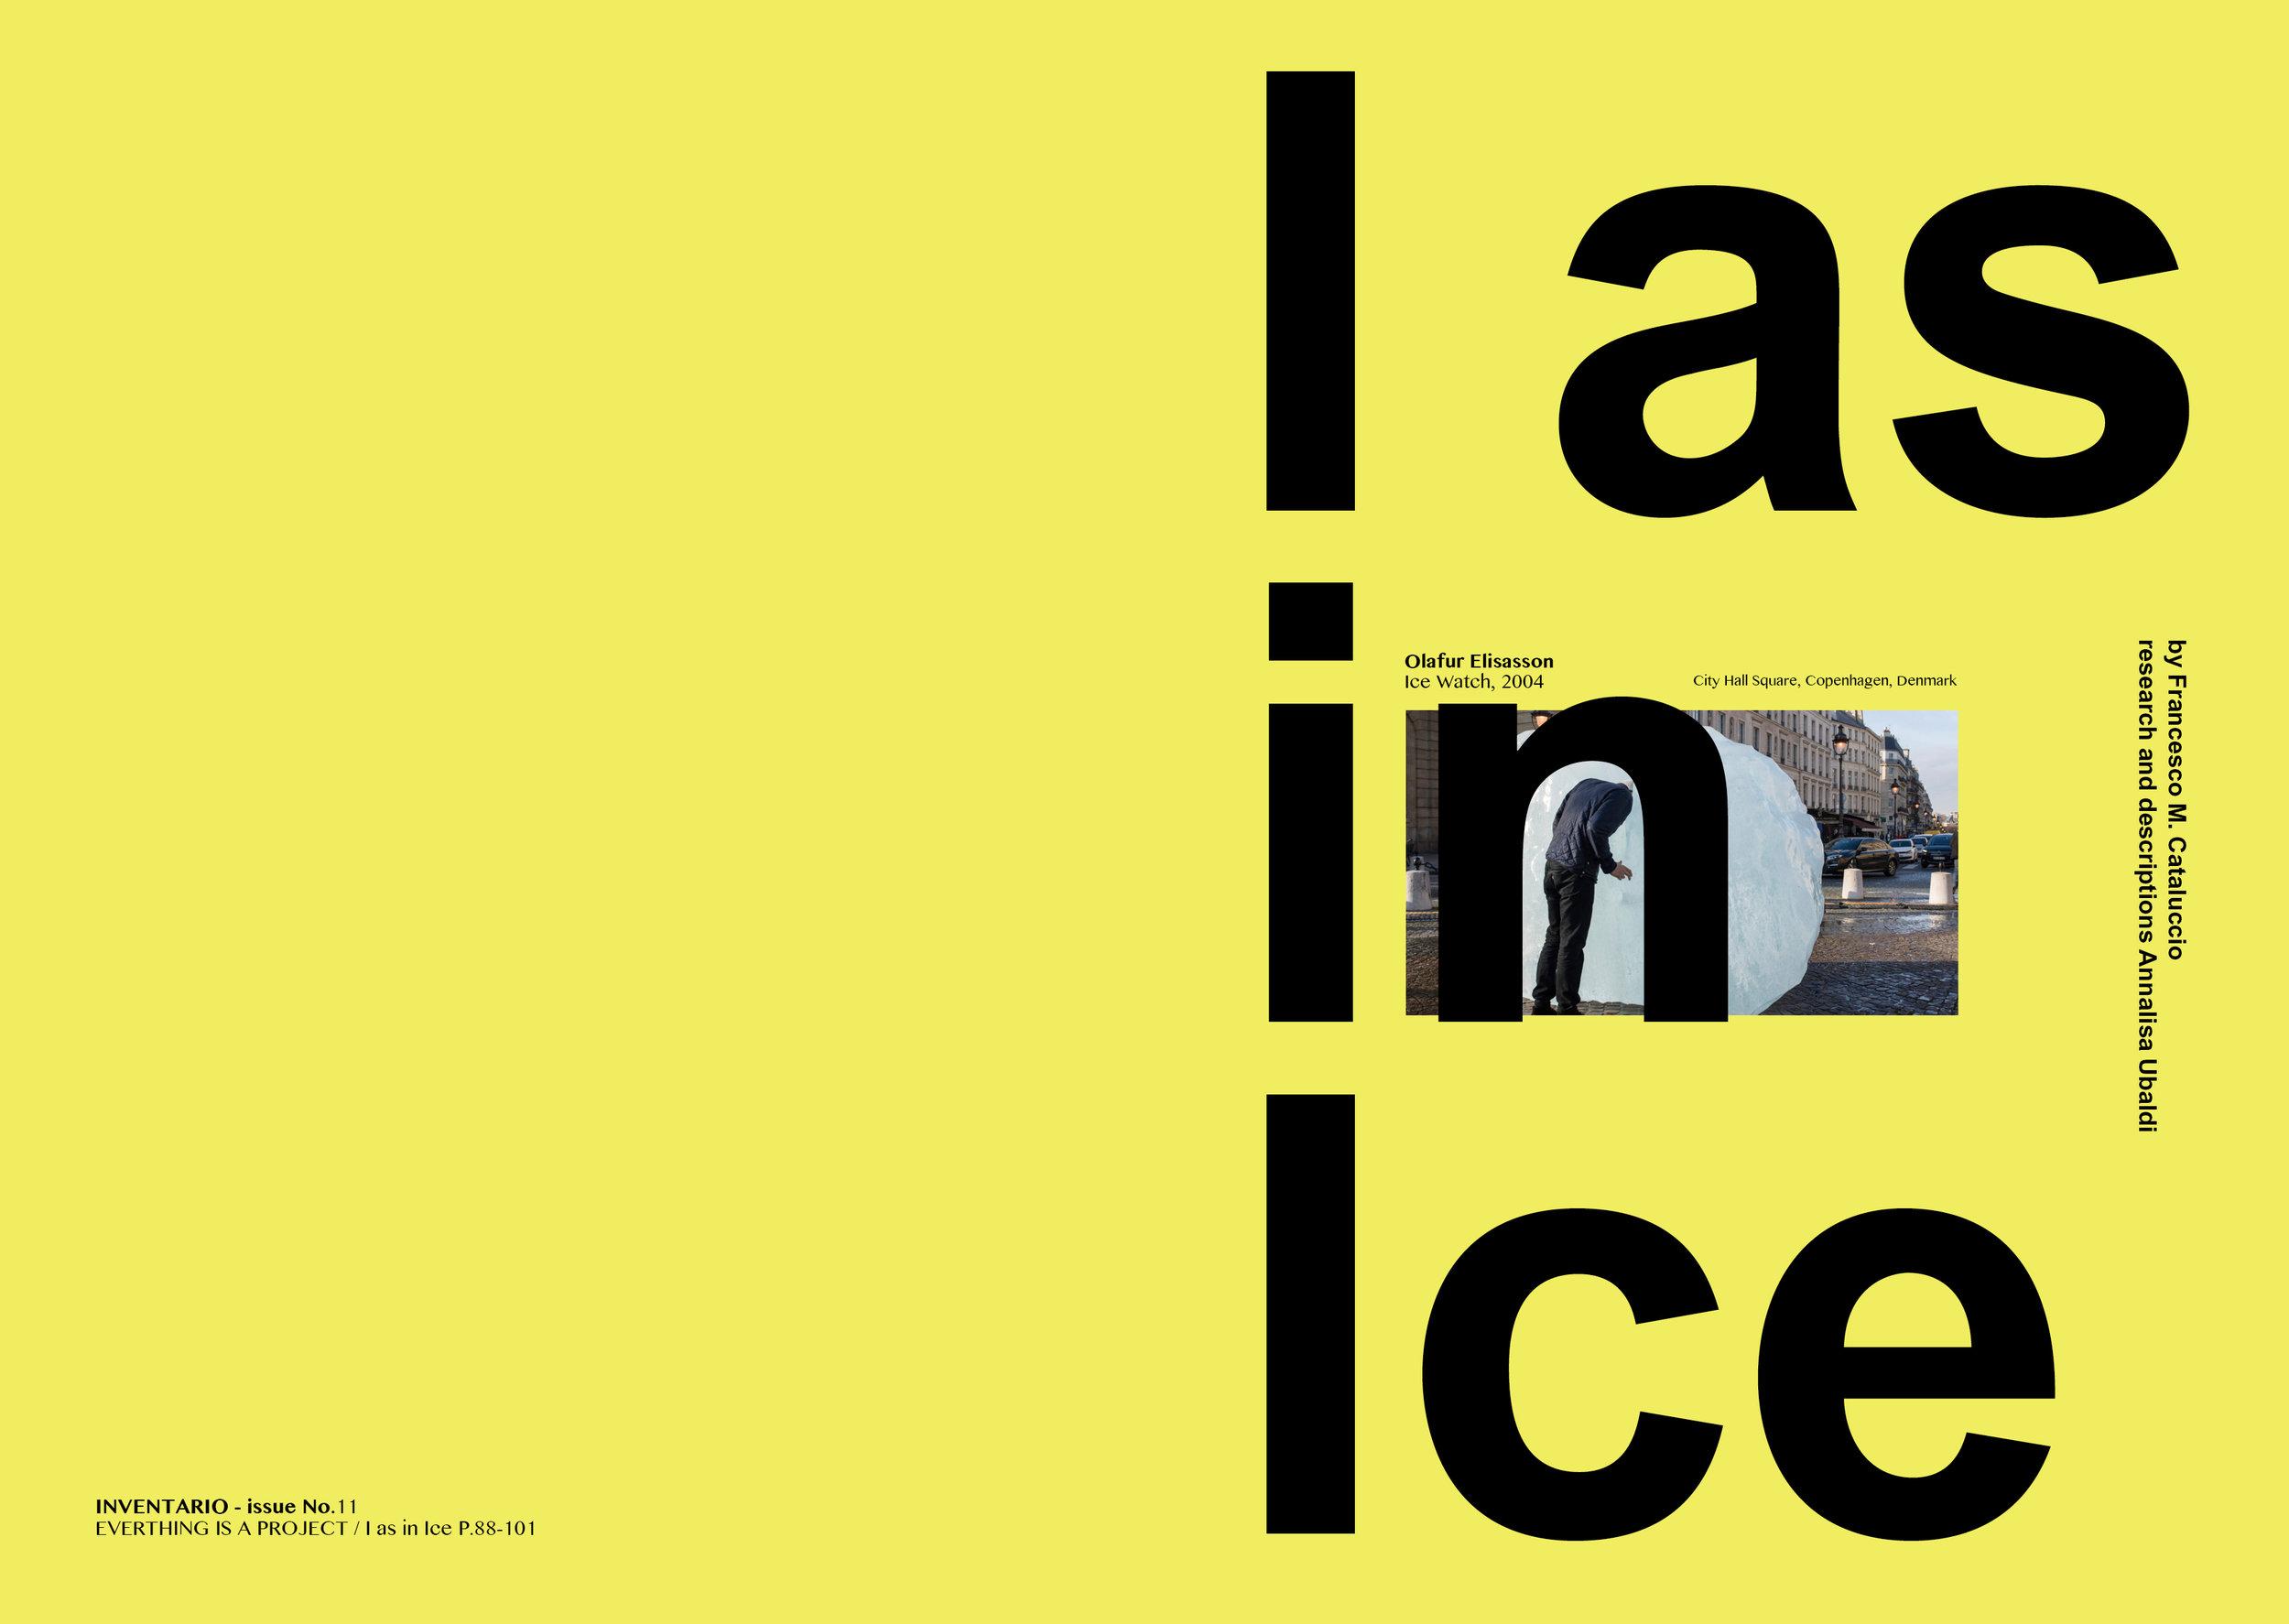 I_as_in_ice_print_yellow2.jpg